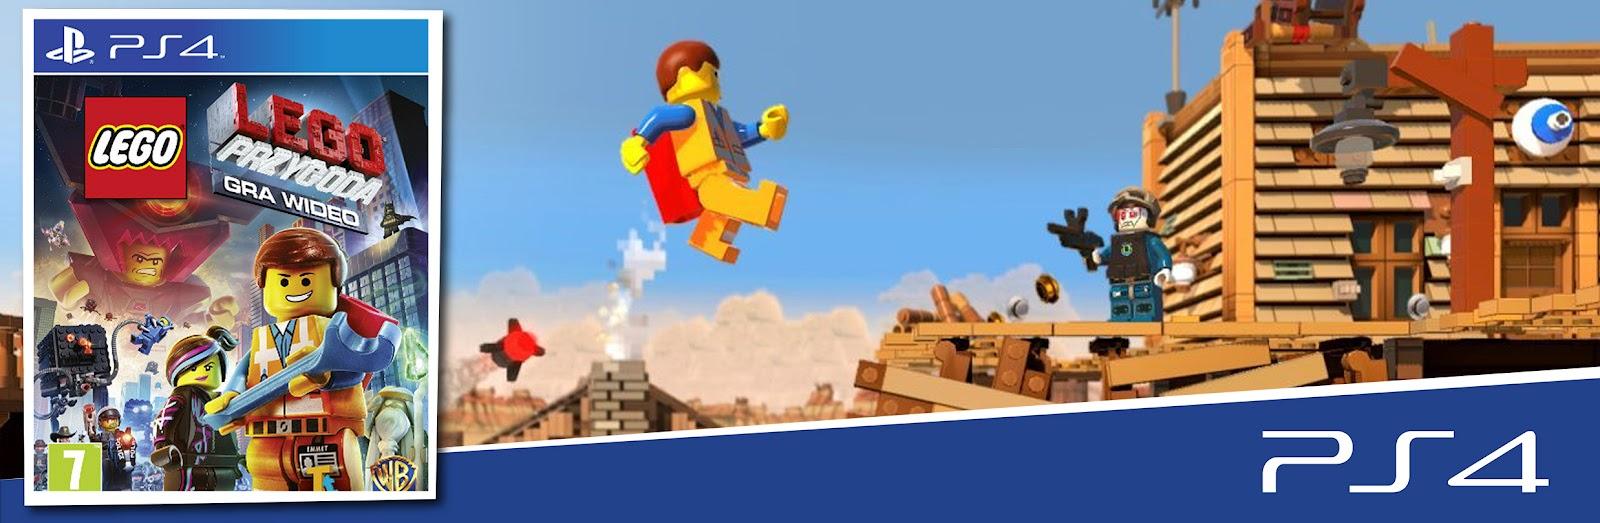 https://pl.webuy.com/product-detail?id=5951892165327&categoryName=playstation4-gry&superCatName=gry-i-konsole&title=lego-przygoda&utm_source=site&utm_medium=blog&utm_campaign=ps4_gbg&utm_term=pl_t10_ps4_kg&utm_content=Lego%3A%20Przygoda